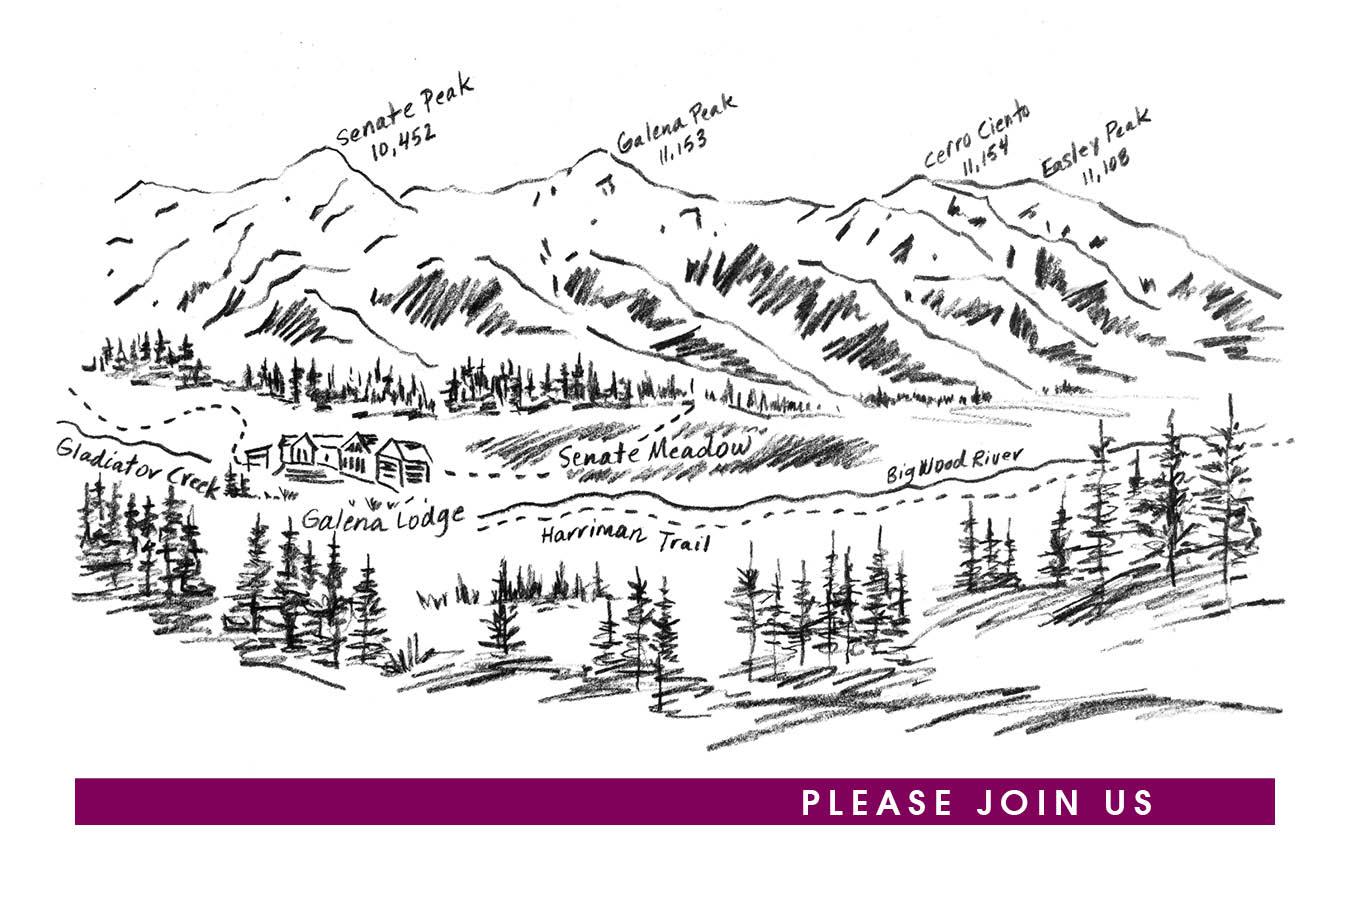 winter benefit invite postcard.jpg